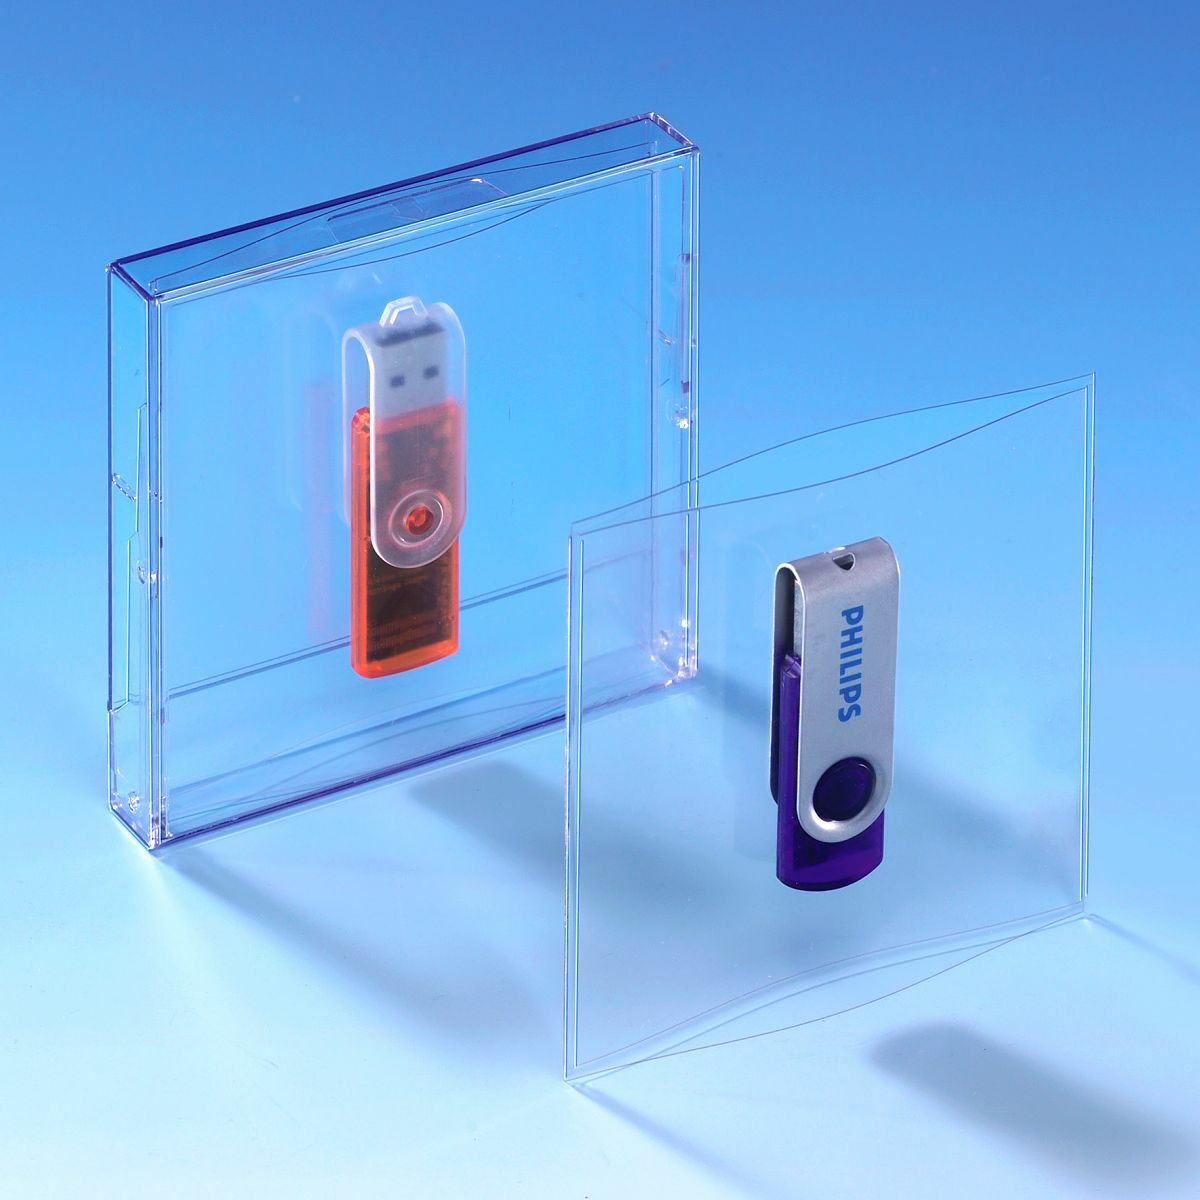 usb boxen set 10er pack clickbox world of boxes aufbewahrungsboxen aus kunststoff kaufen. Black Bedroom Furniture Sets. Home Design Ideas